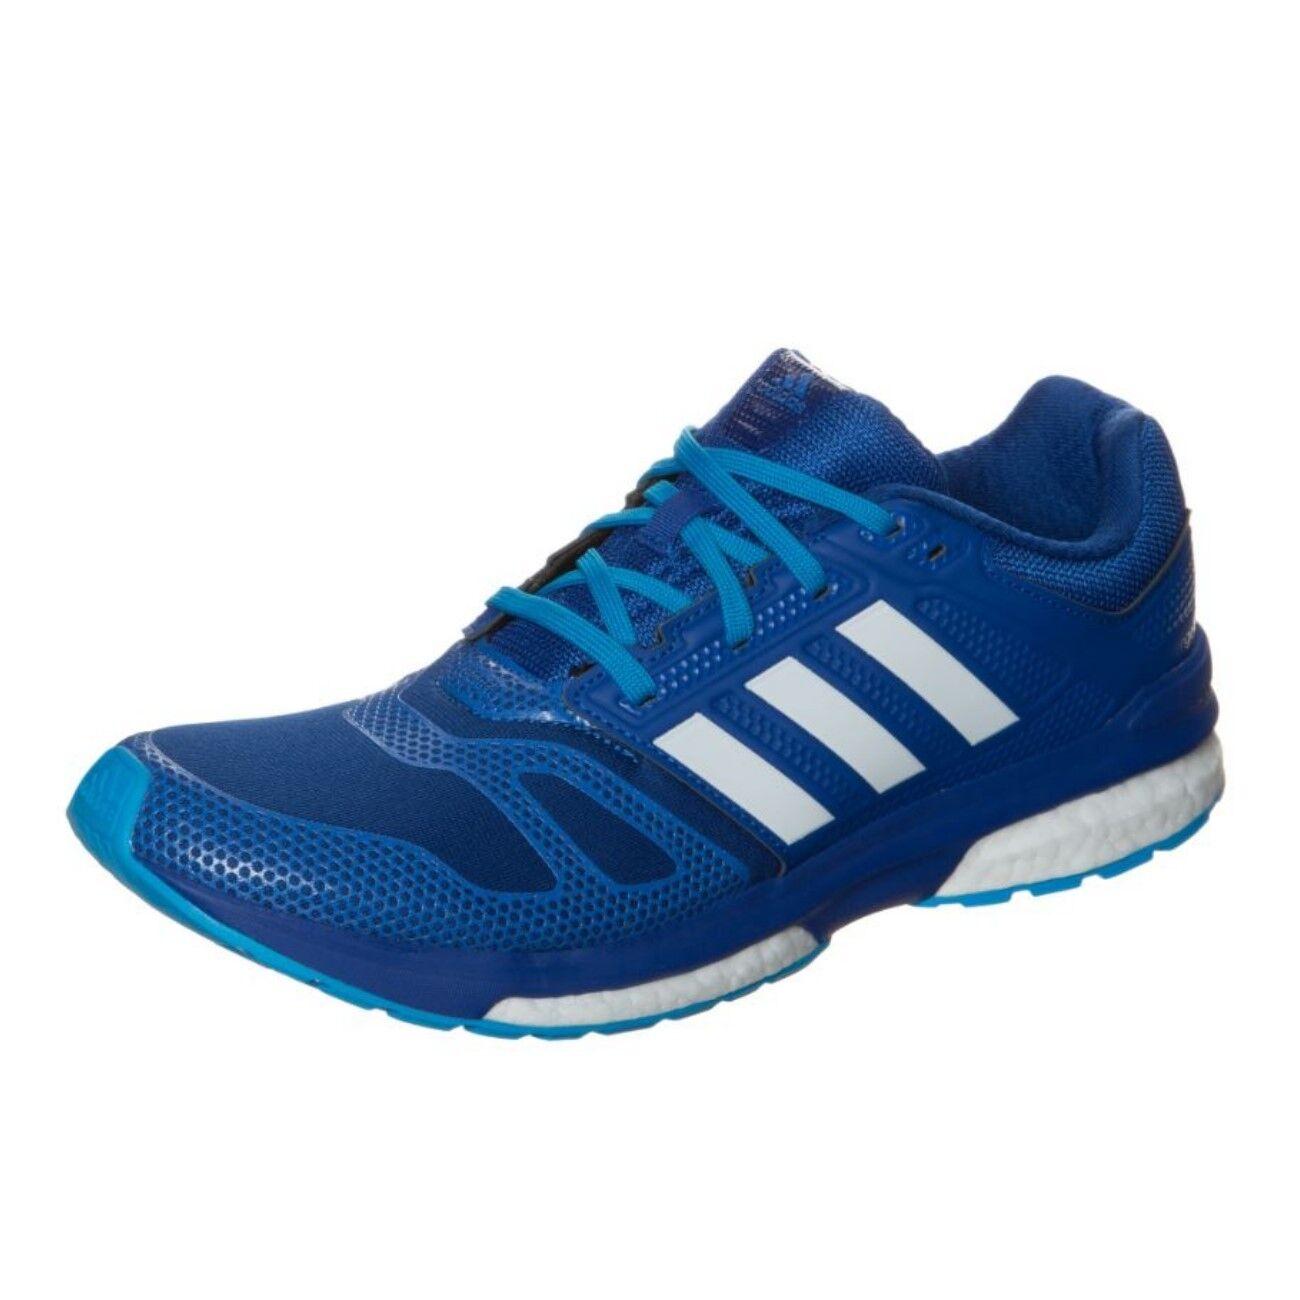 Adidas Schuhe Herren Laufschuhe Revenge Boost 2 M Techfit Runningschuhe blau